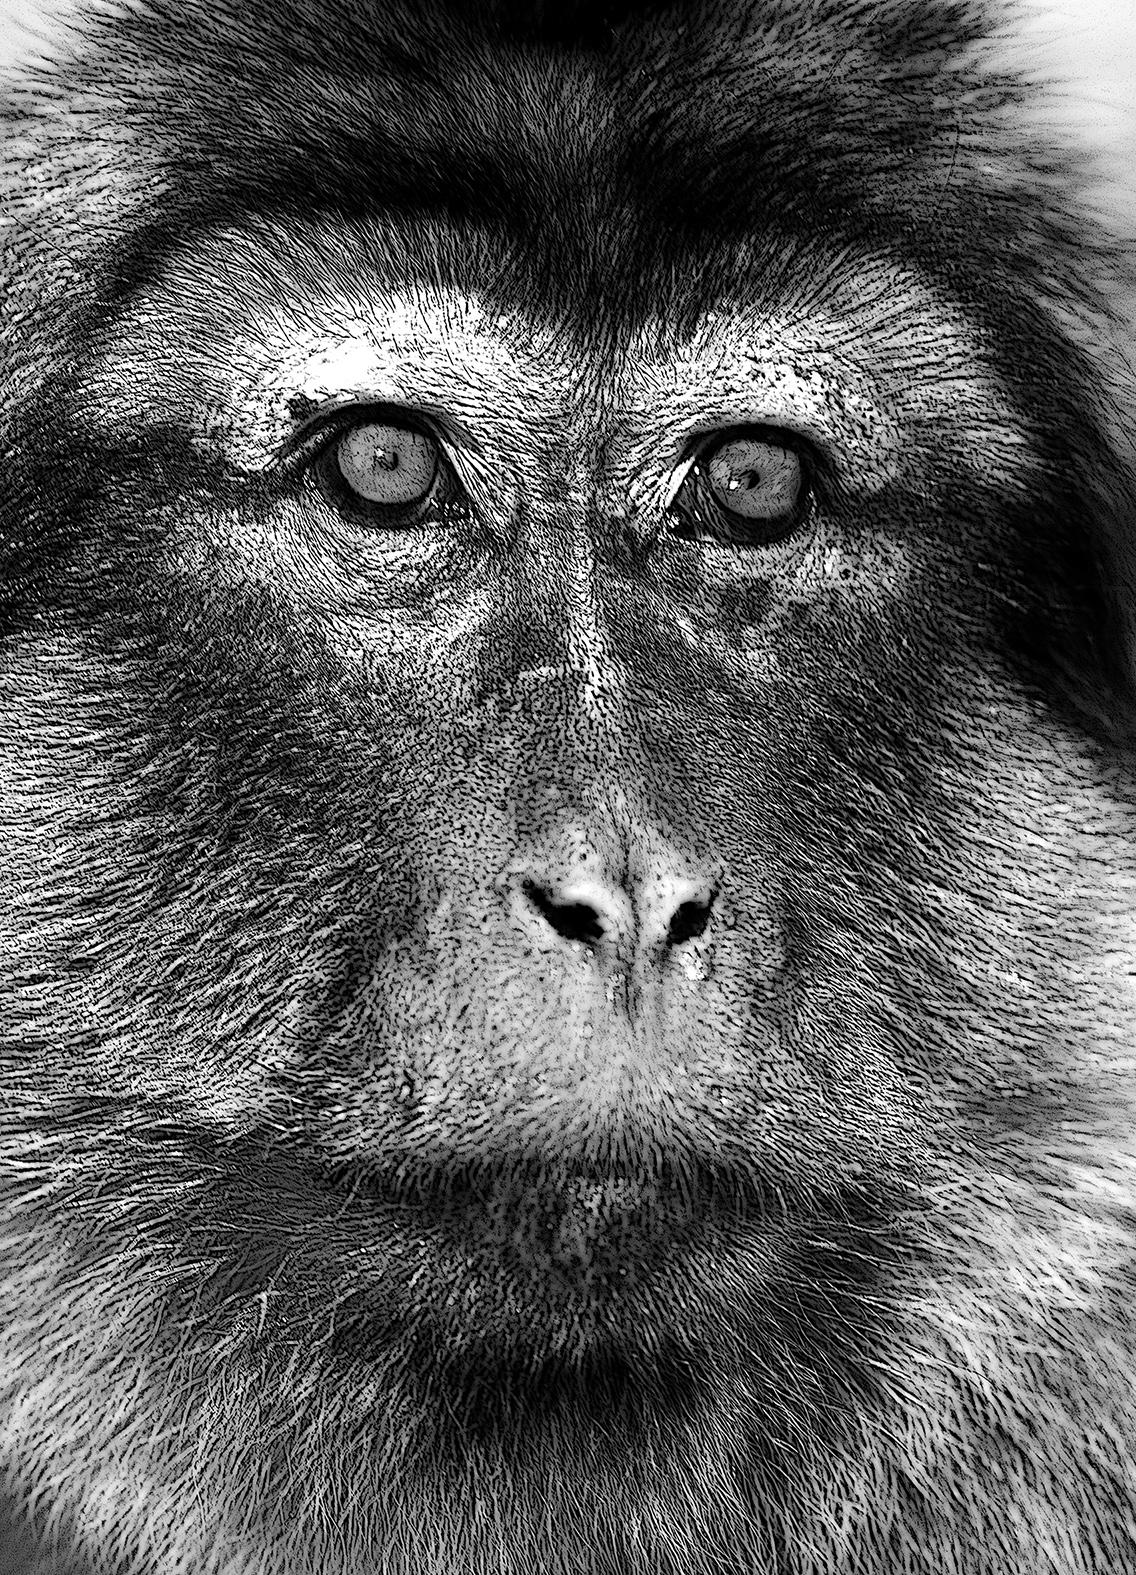 Mon ami, le macaque.